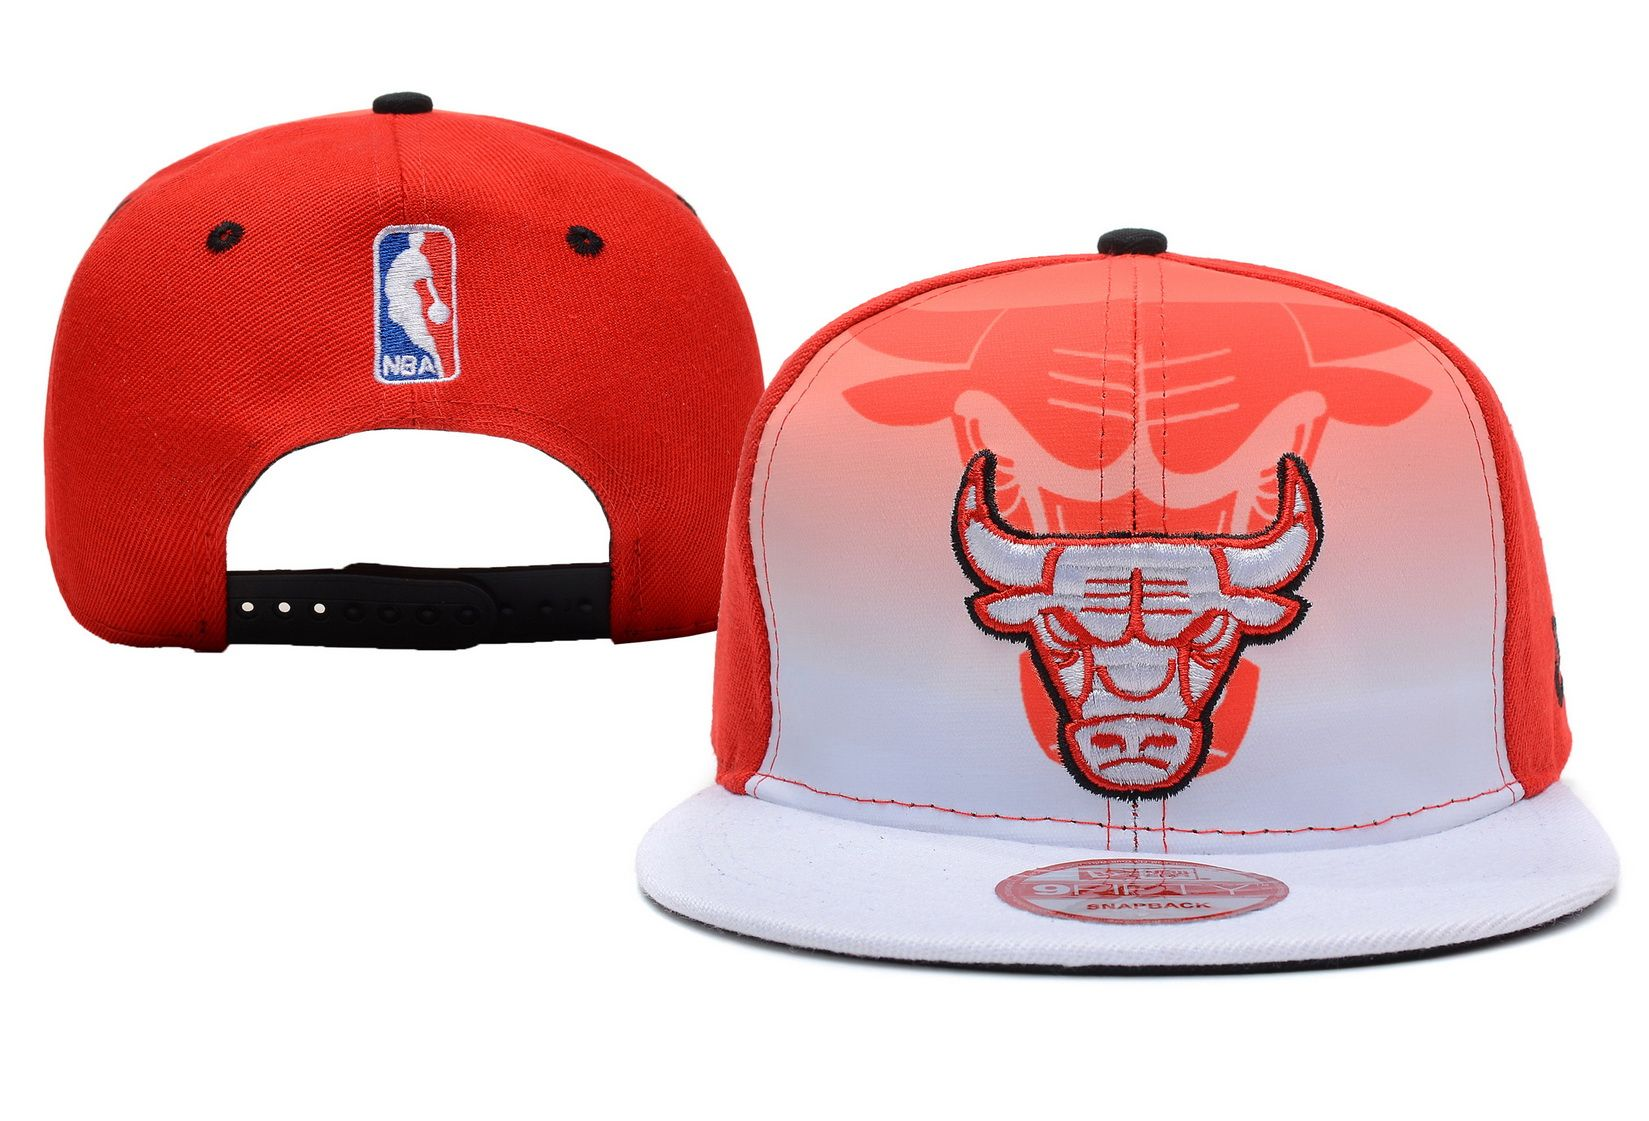 NBA CHICAGO BULLS SNAPBACK New Era White Red 912! Only $8.90USD